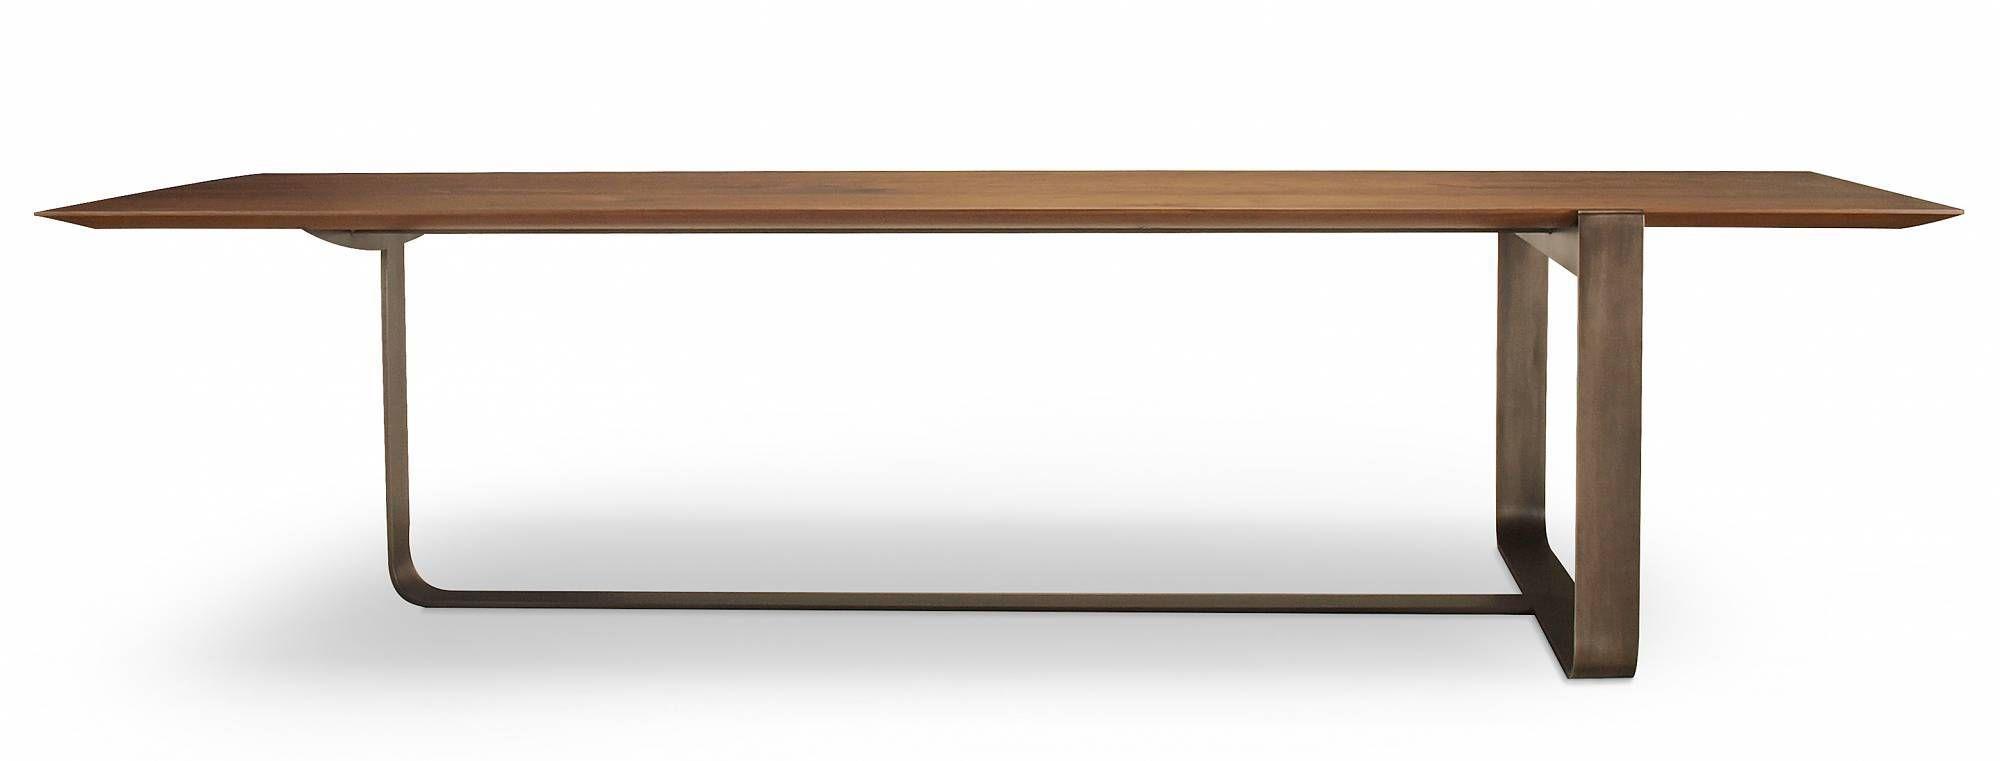 cutting edge furniture. Skram Furniture Company Craft Their Products Using \u0027traditional Techniques \u0026 Cutting-edge Fabrication\u0027 Cutting Edge I